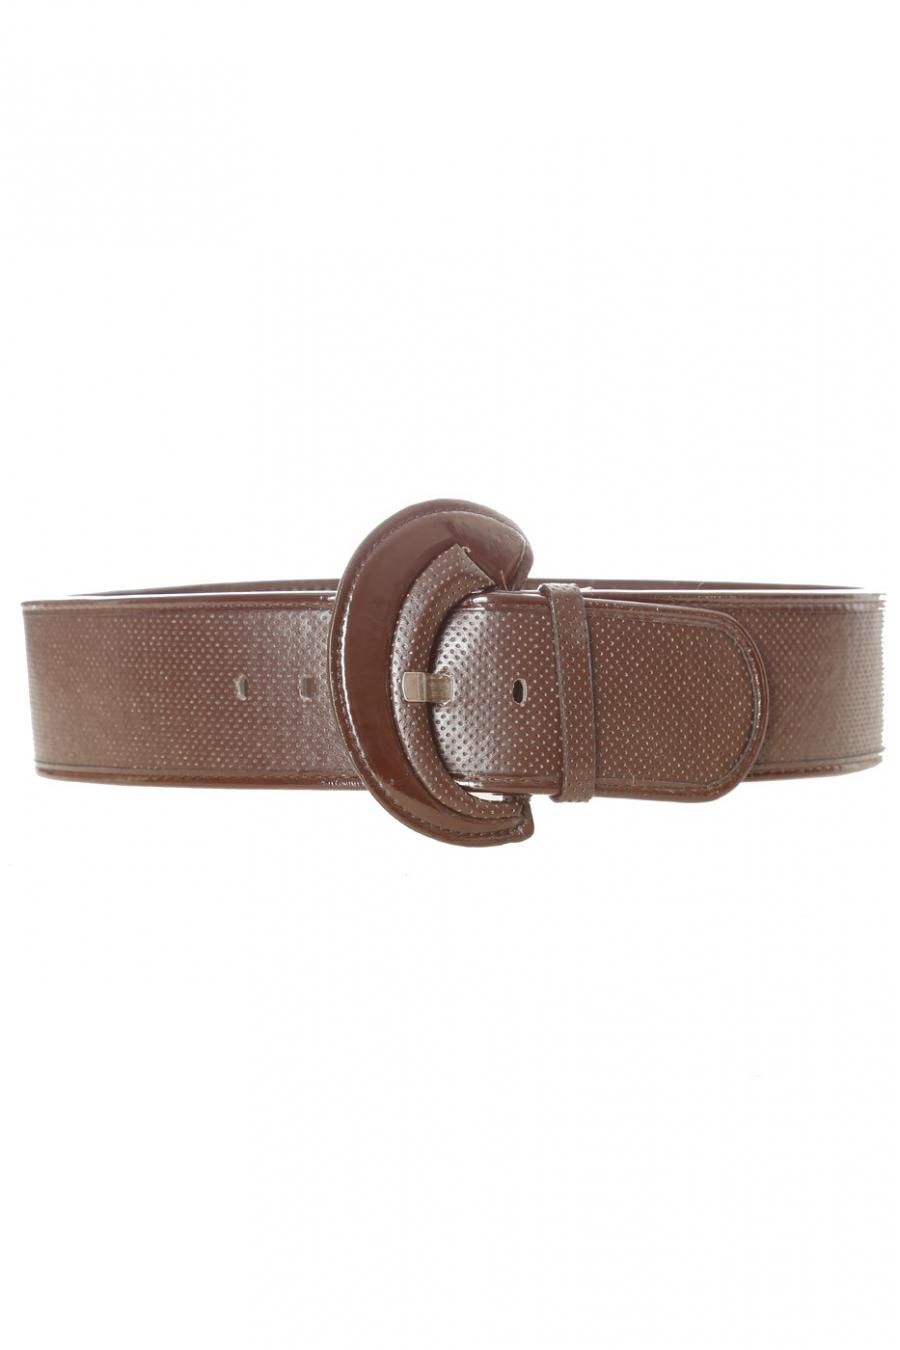 Bruine doorgestikte riem met glanzende ovale gesp. BG-0101